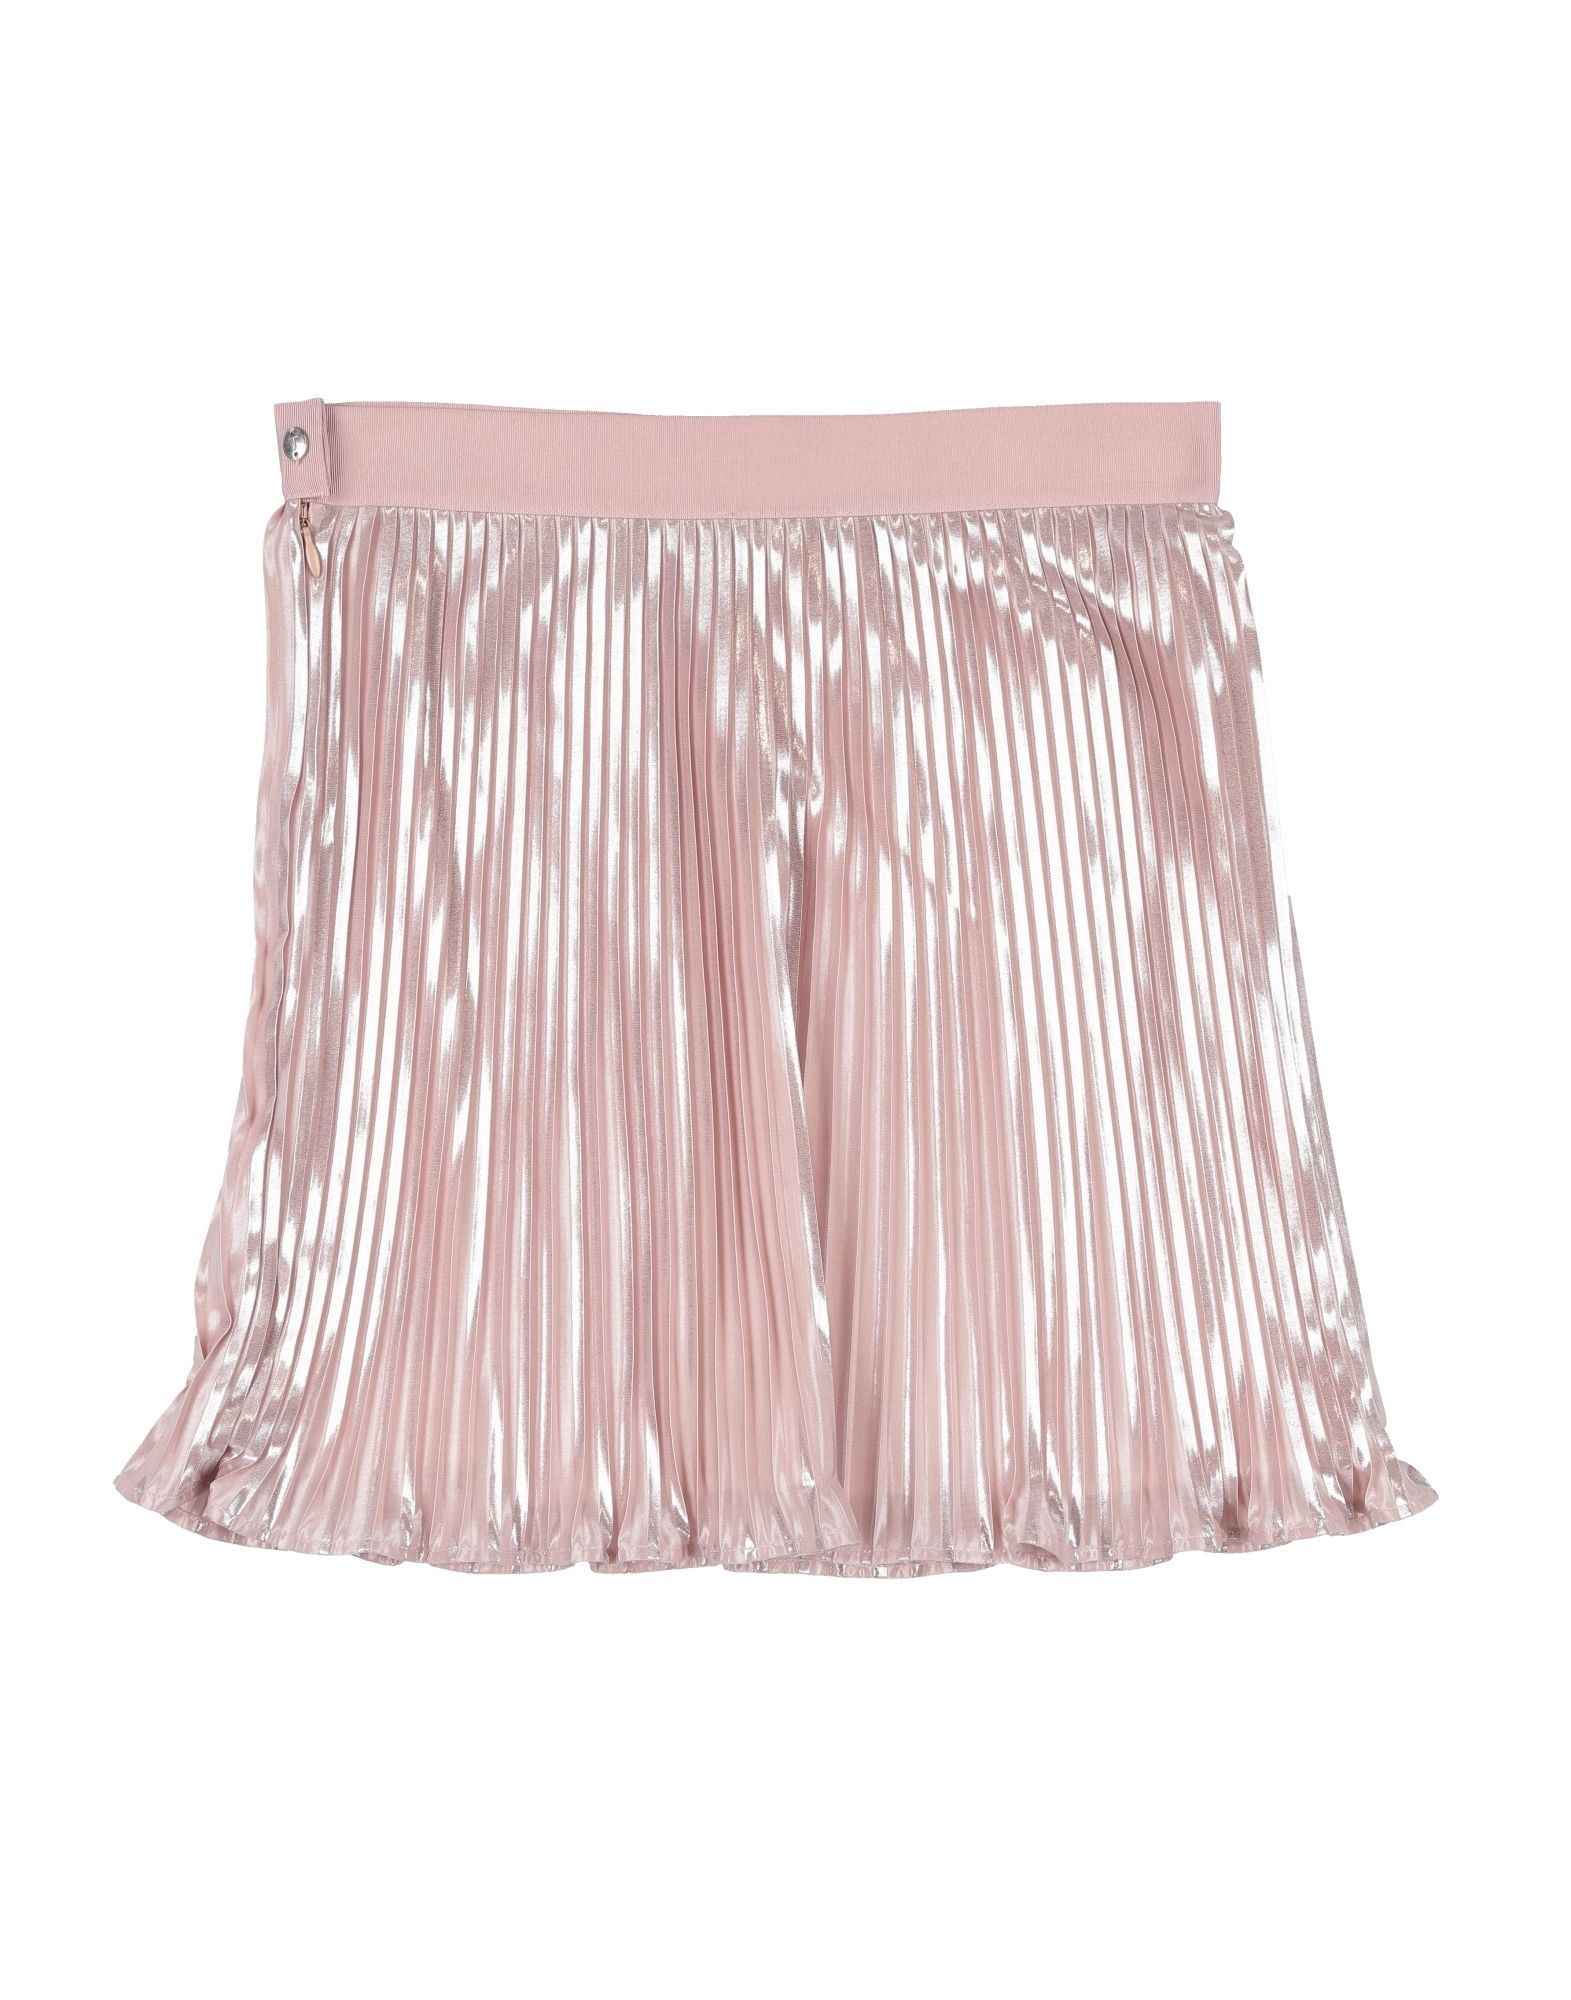 SKIRTS Girl Trussardi Junior Pink Polyester